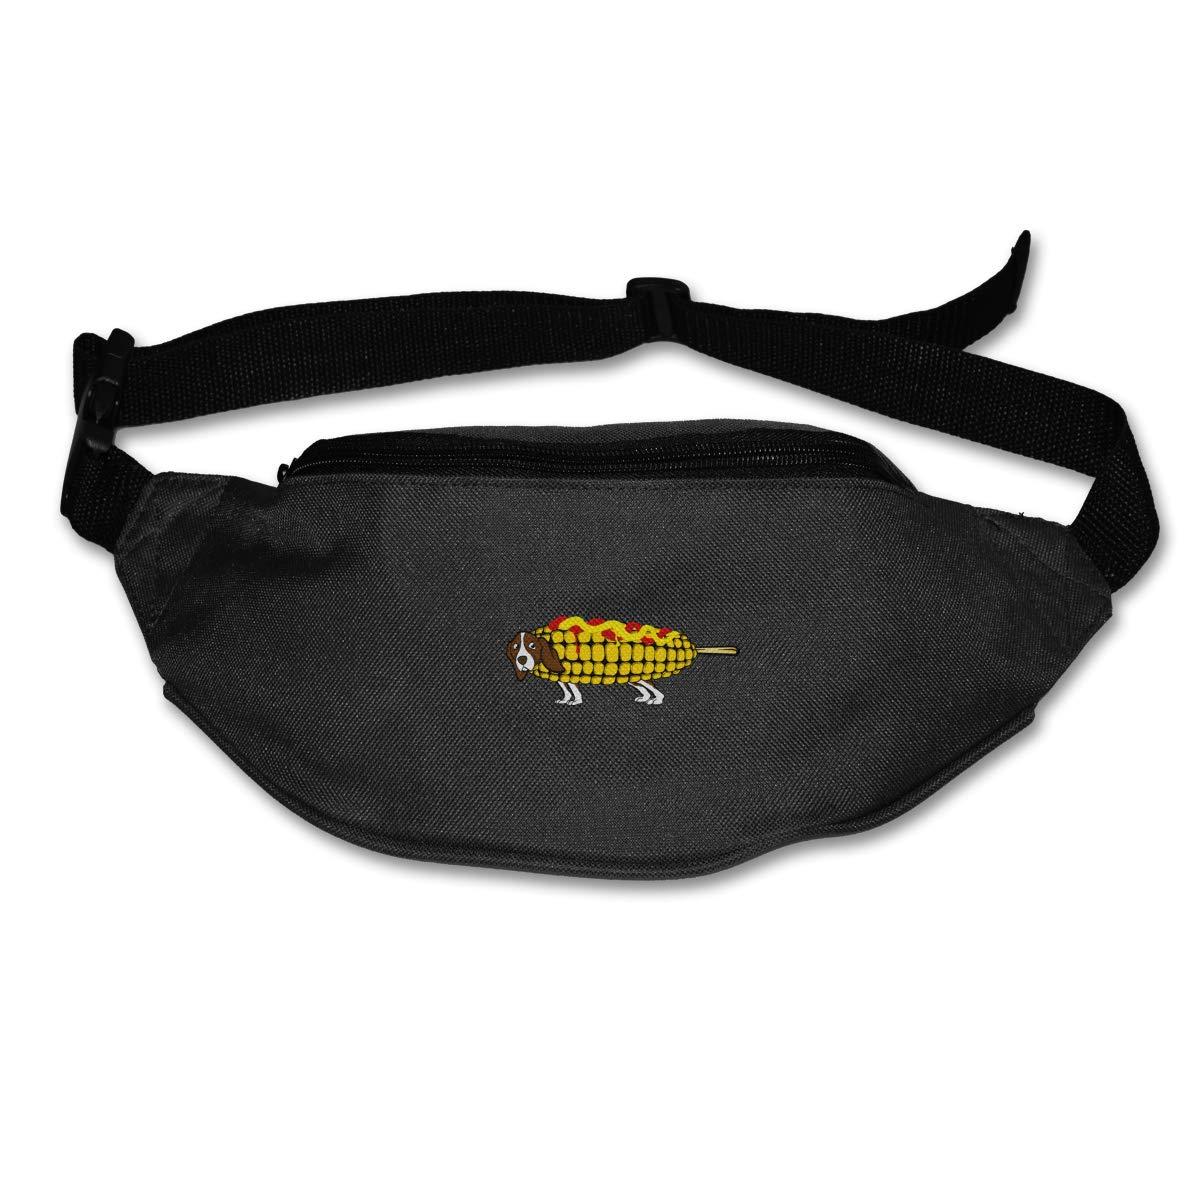 Corn Dog Sport Waist Bag Fanny Pack Adjustable For Run